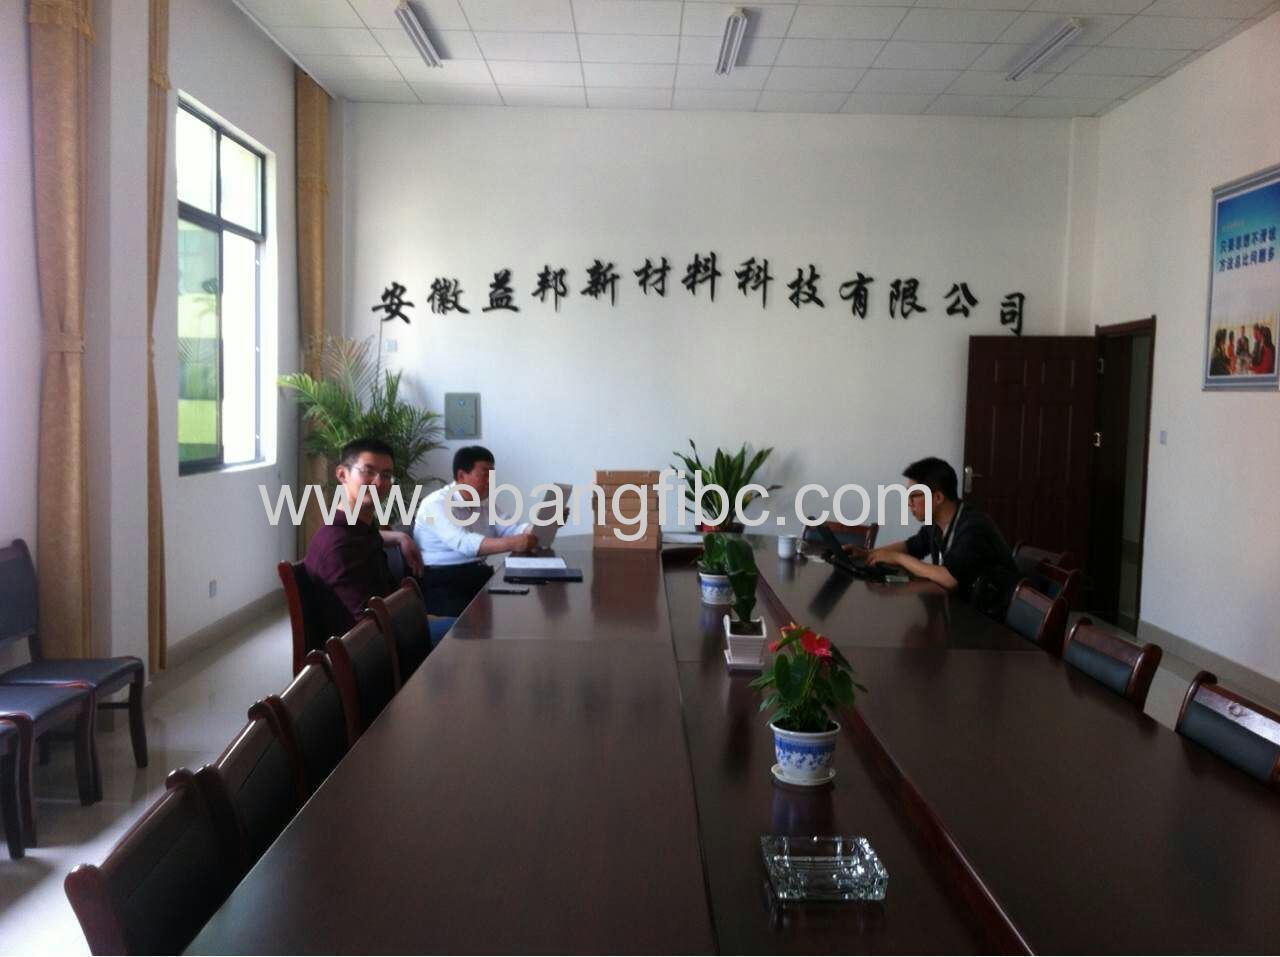 Ebang-FIBC SGS certification verifying